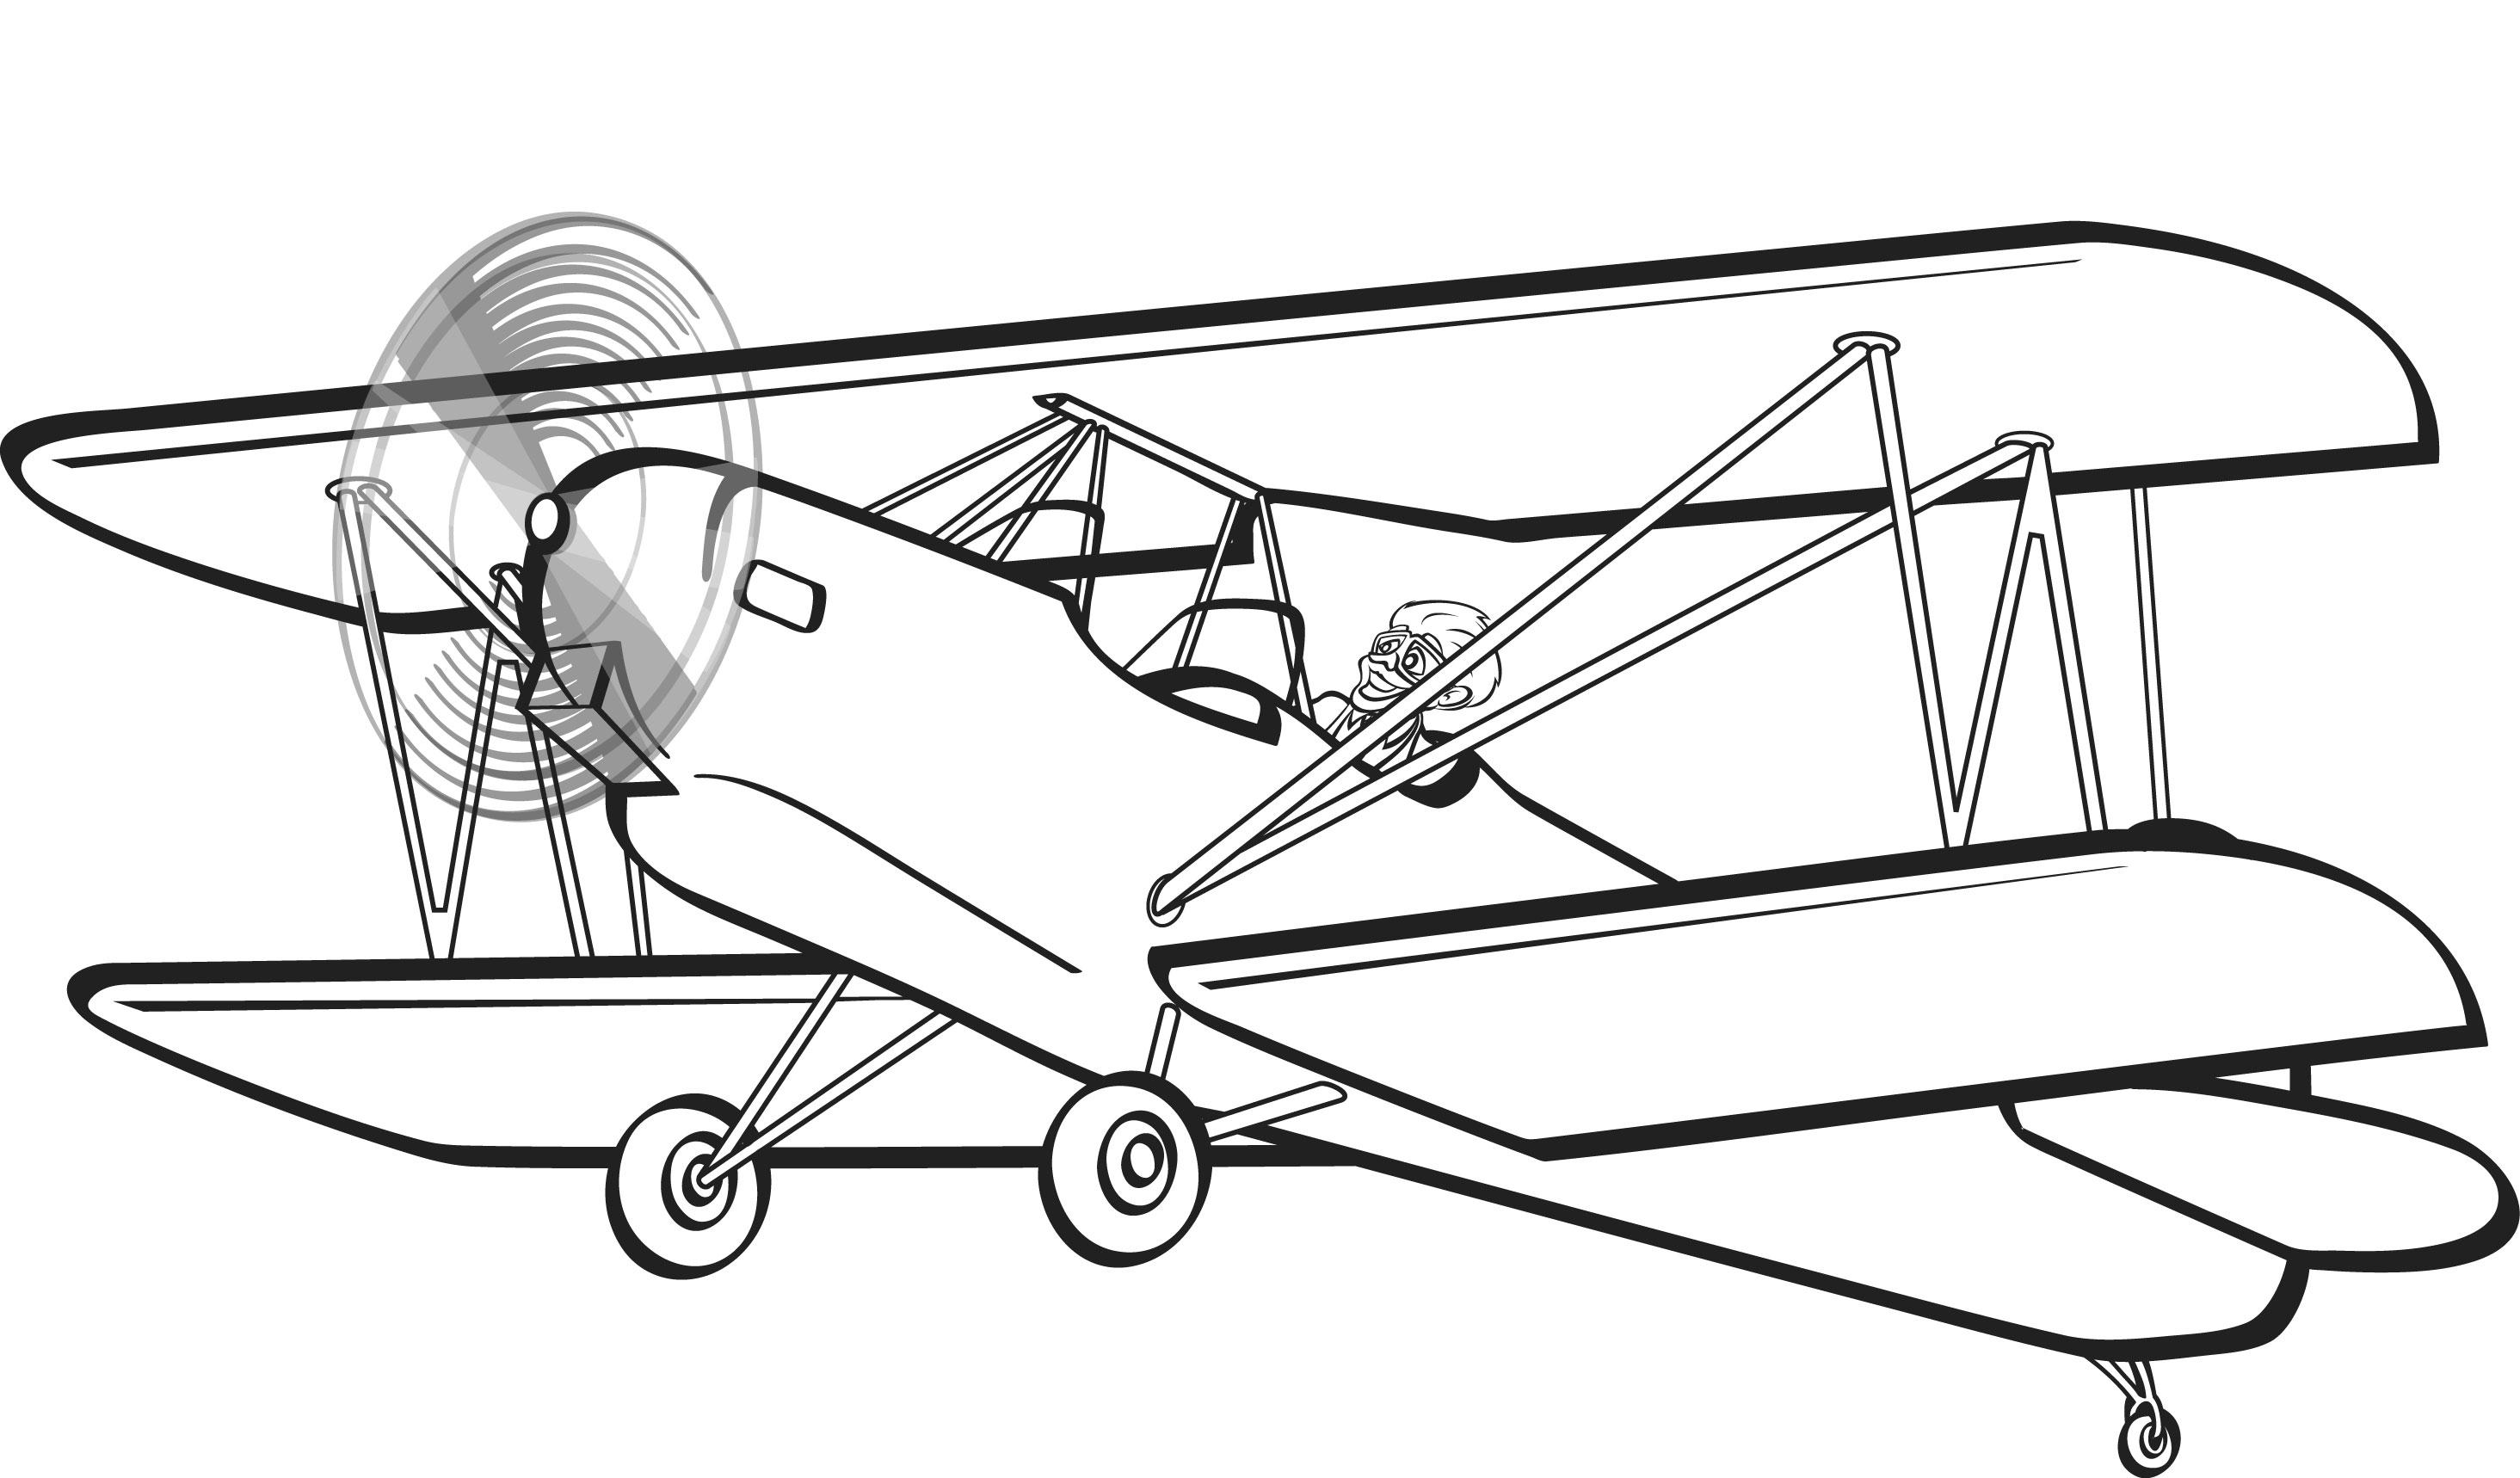 Clip art . Biplane clipart black and white